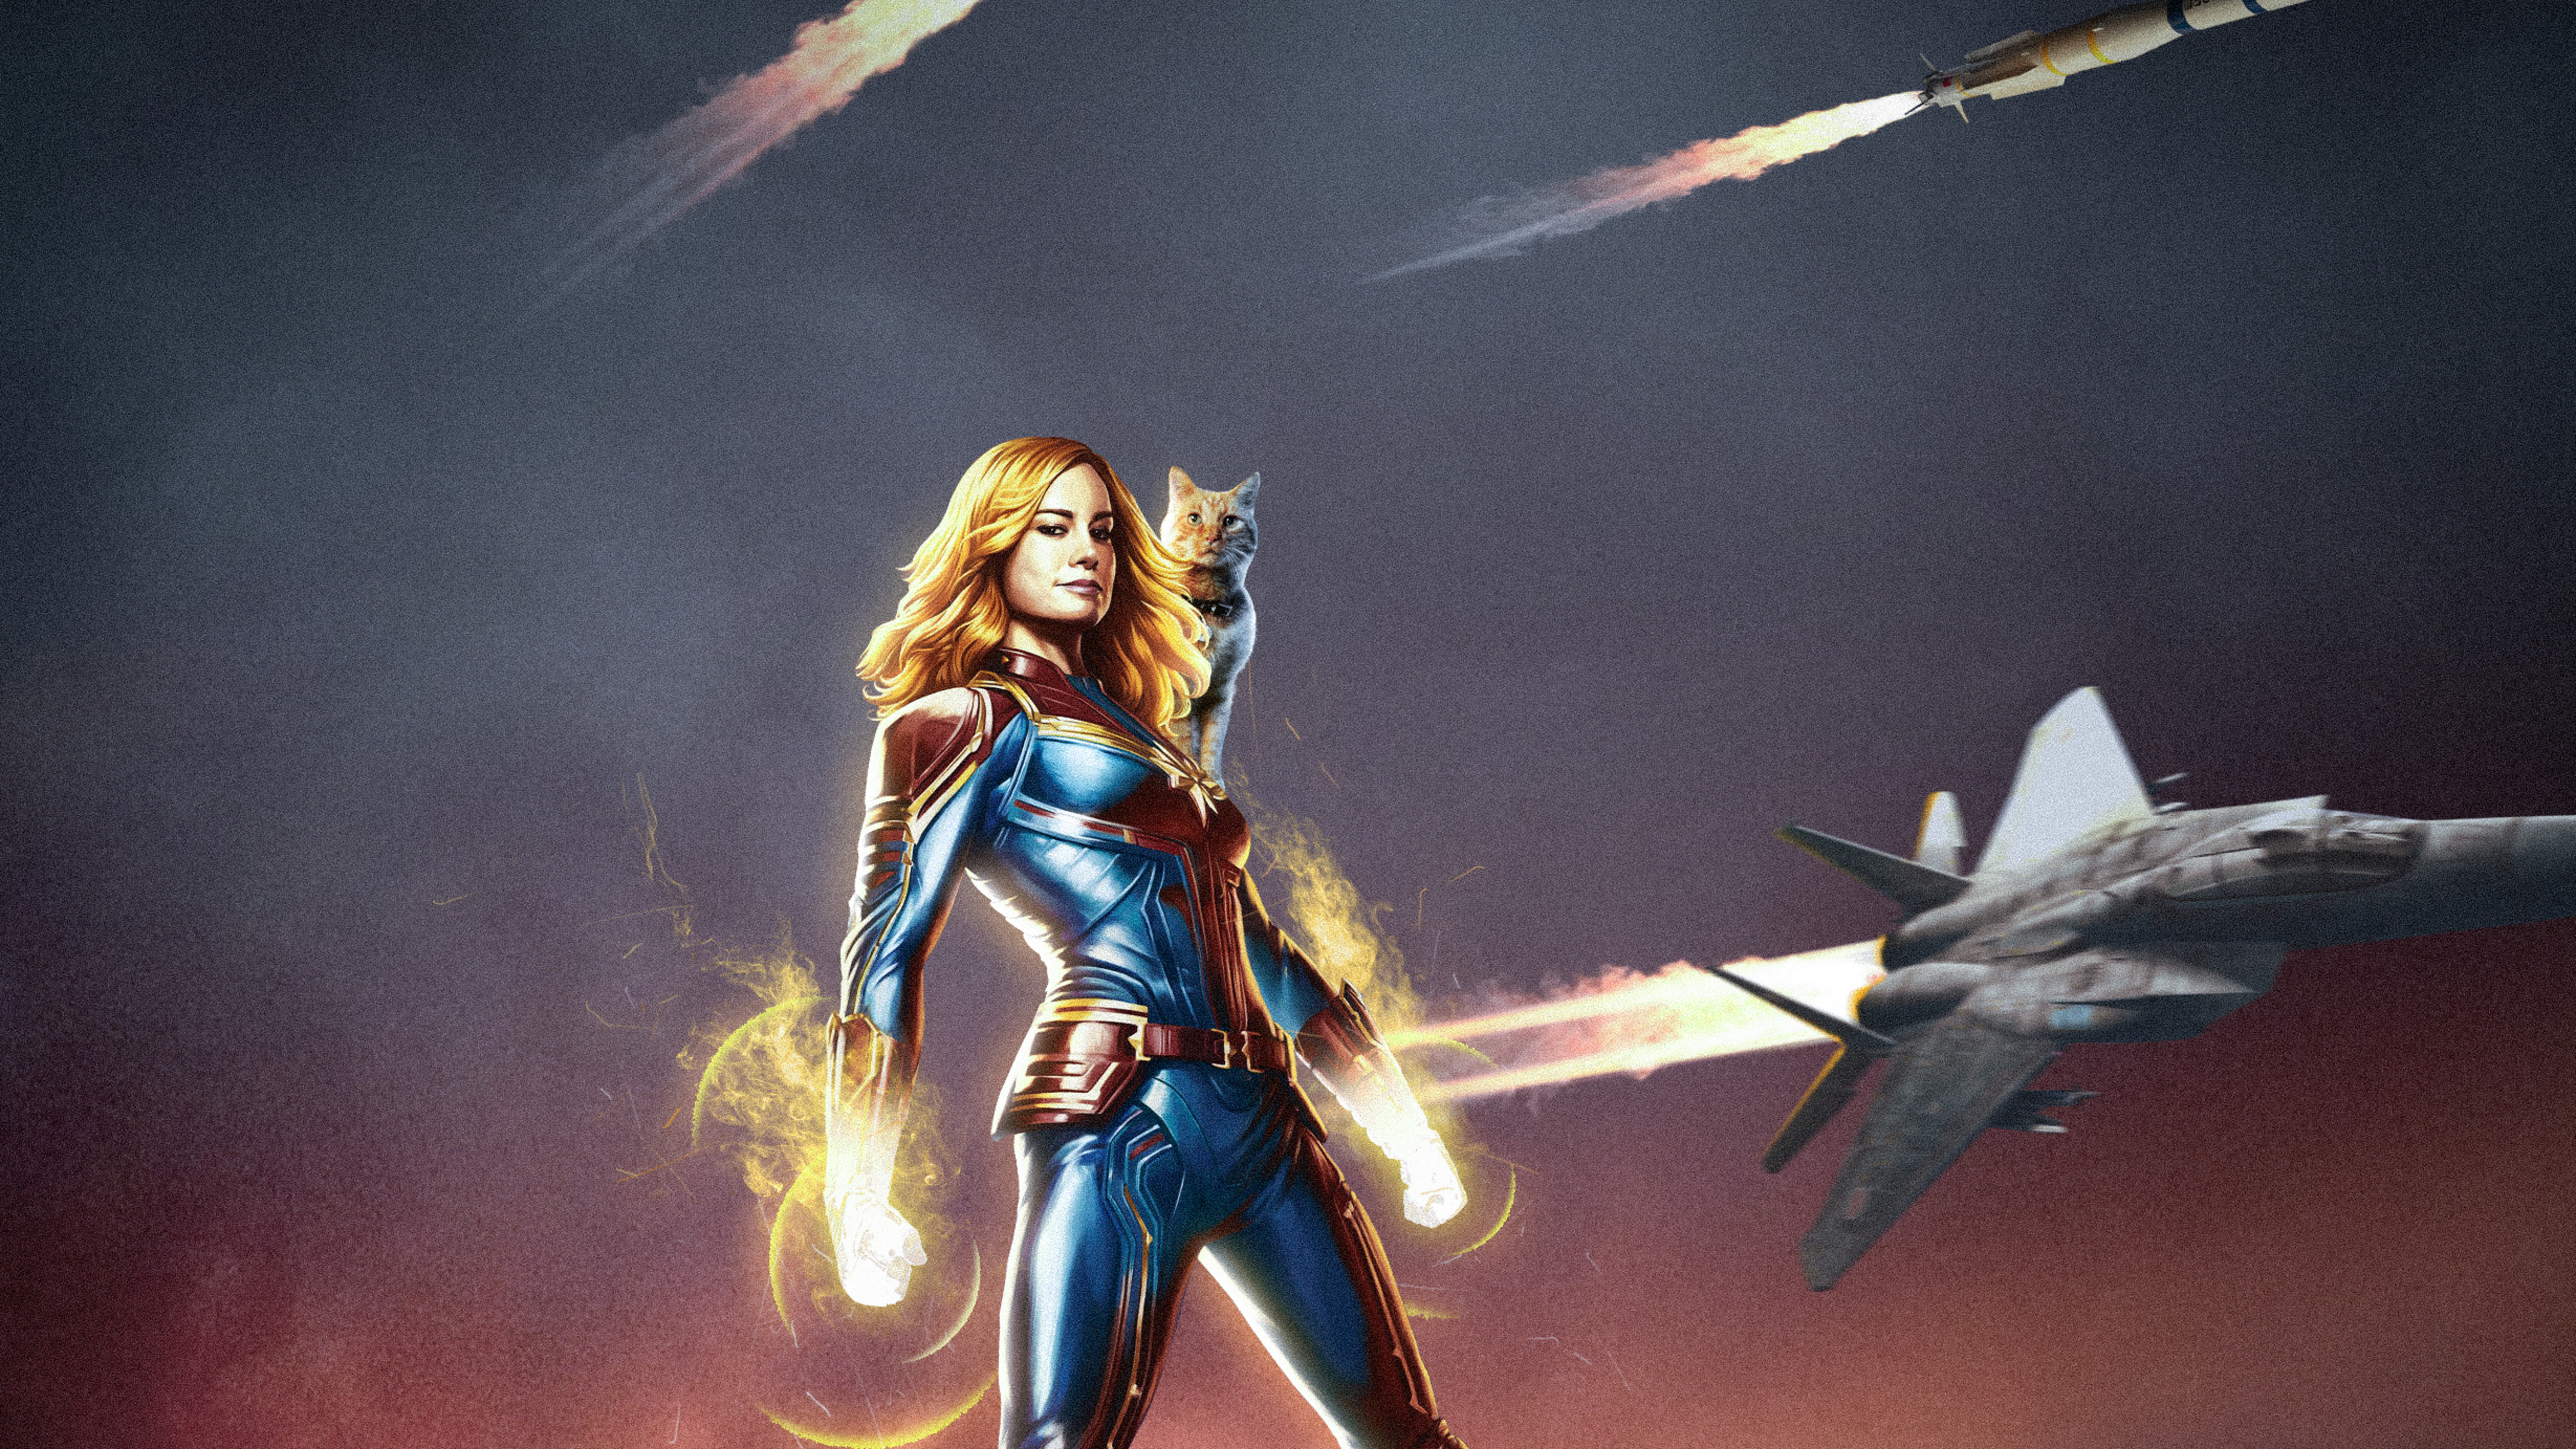 5120x2880 Captain Marvel Movie Poster Art 5k Wallpaper Hd